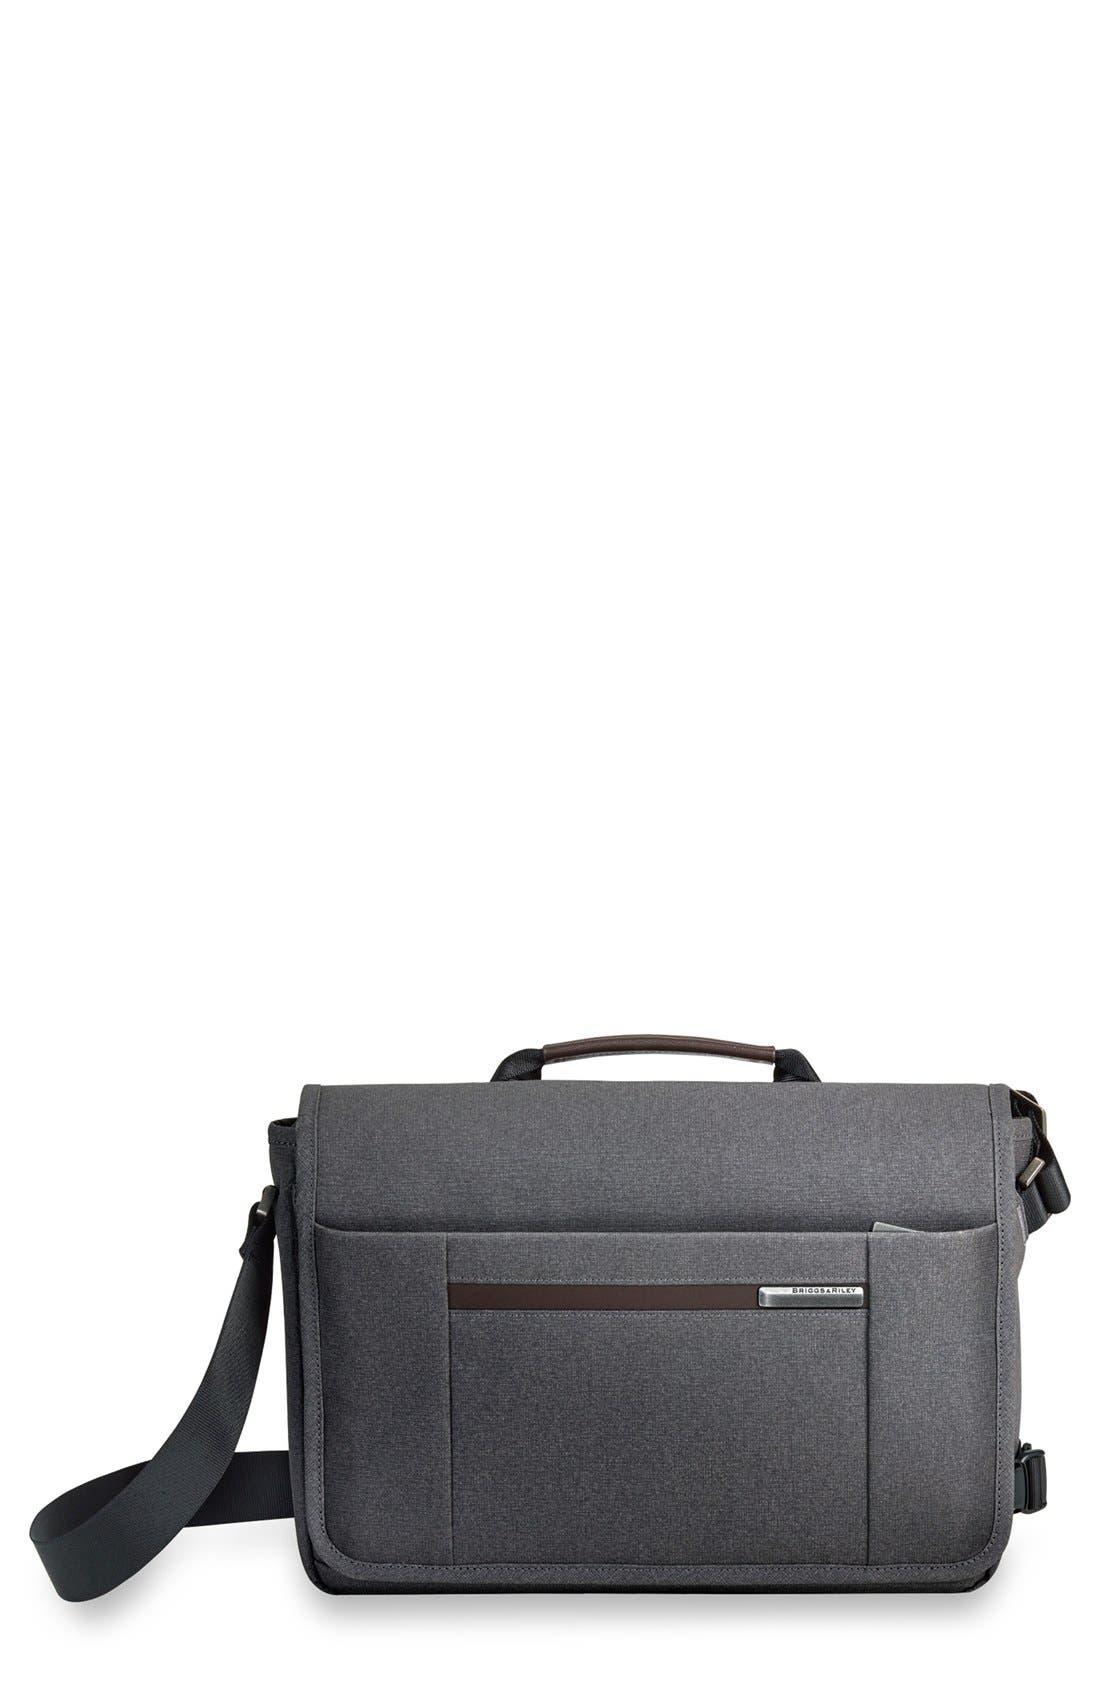 Briggs & Riley 'Kinzie Street - Micro' Messenger Bag